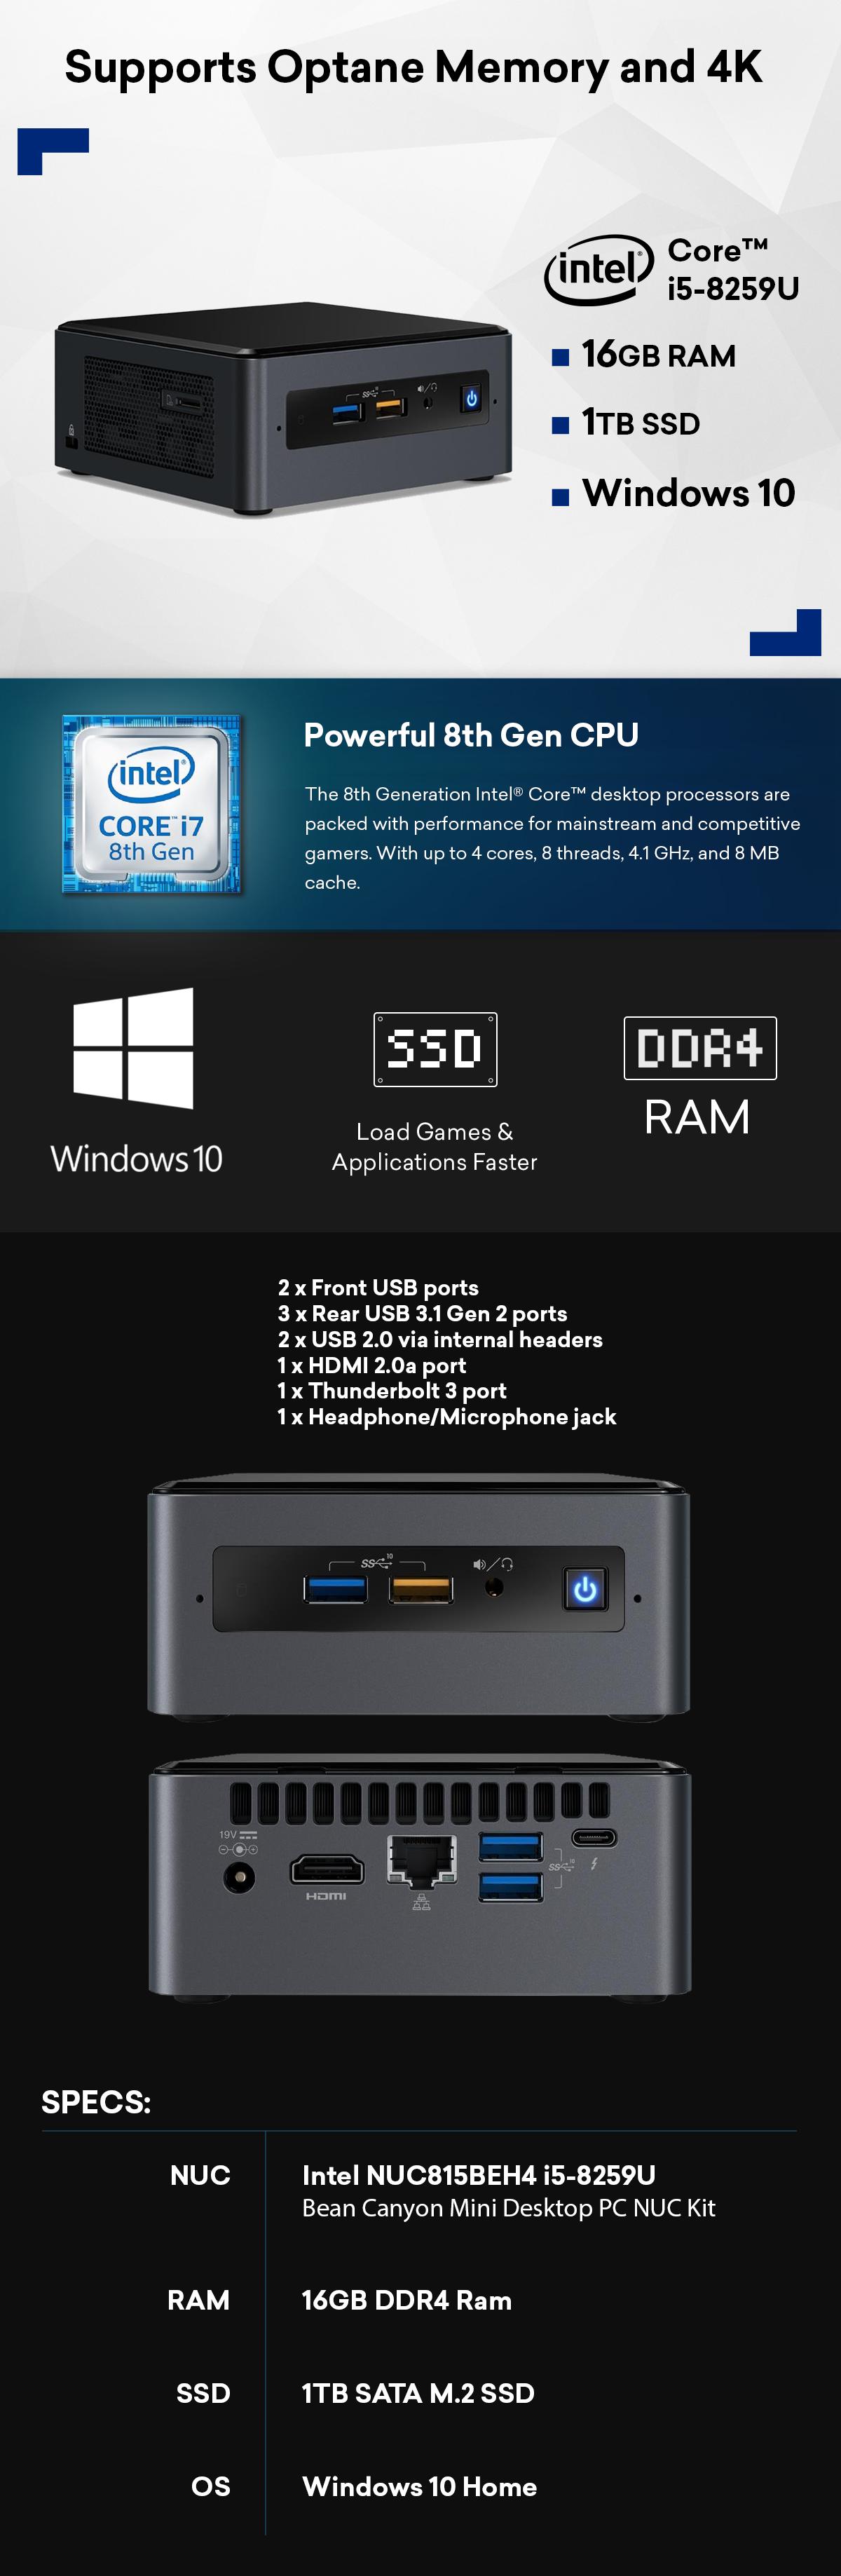 Intel Nuc i5 16GB 1TB WiFi Thunderbolt 3 Windows 10 Home PC System